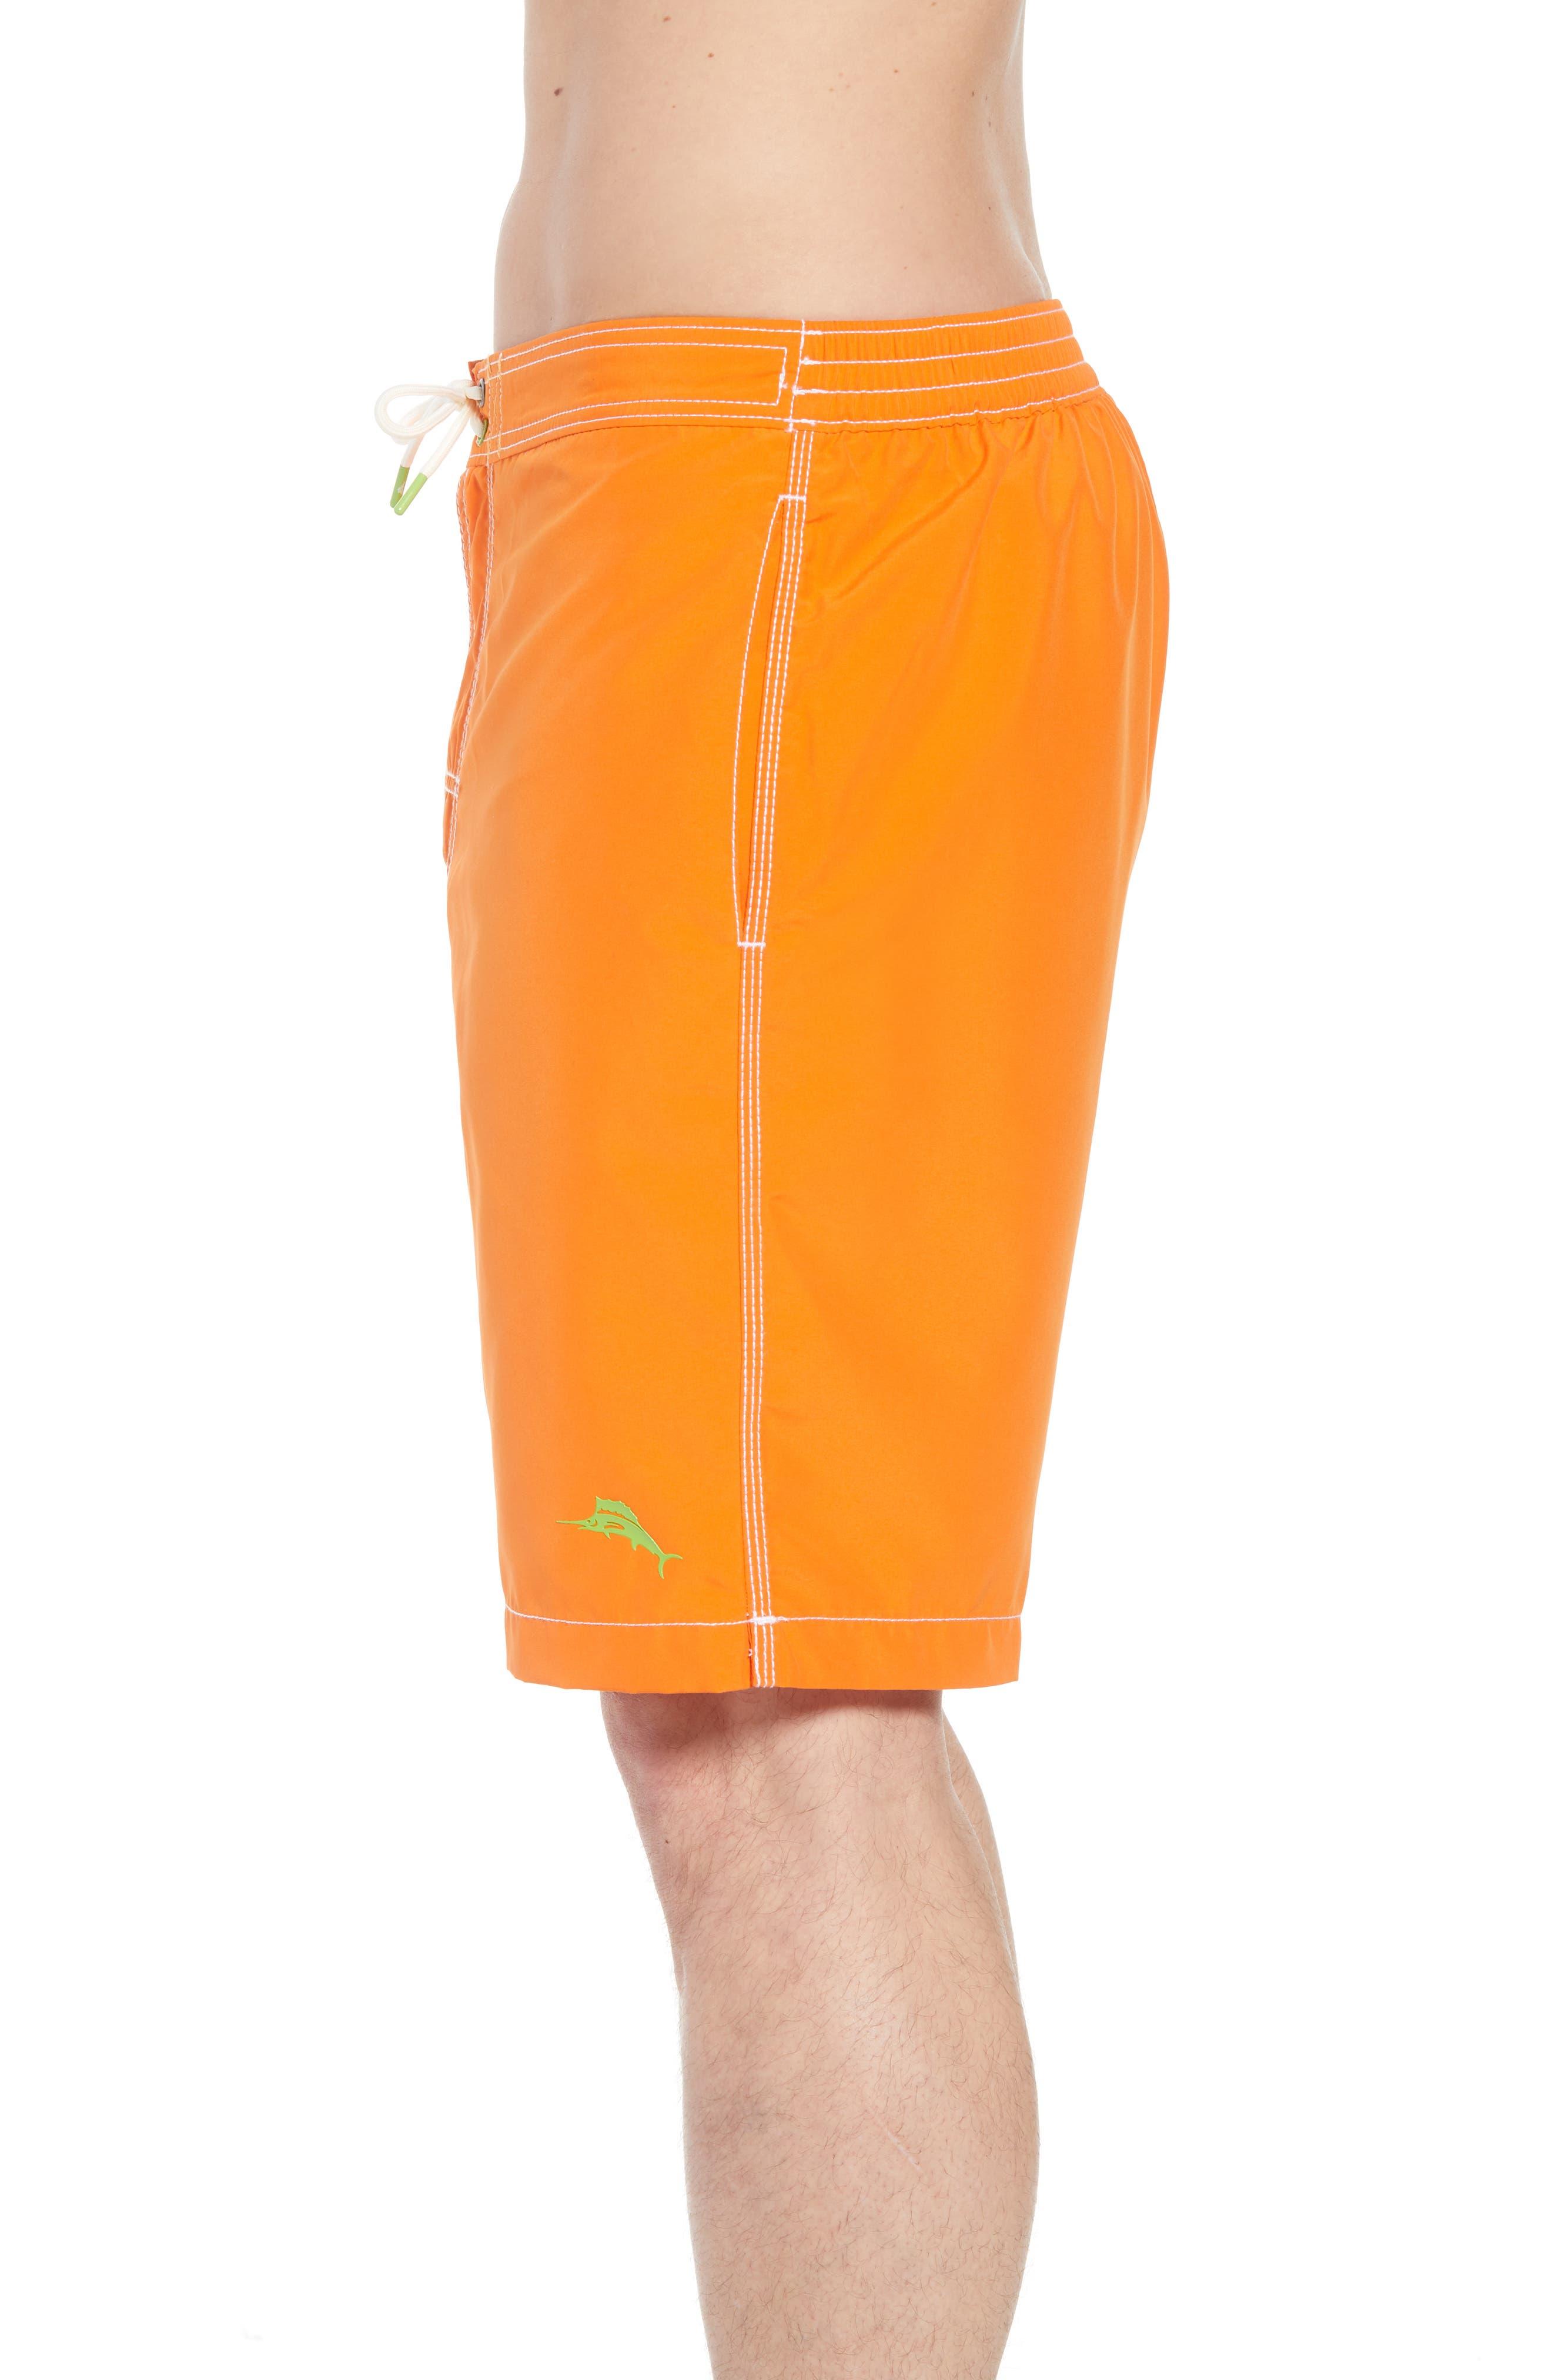 Baja Beach Board Shorts,                             Alternate thumbnail 3, color,                             Curuba